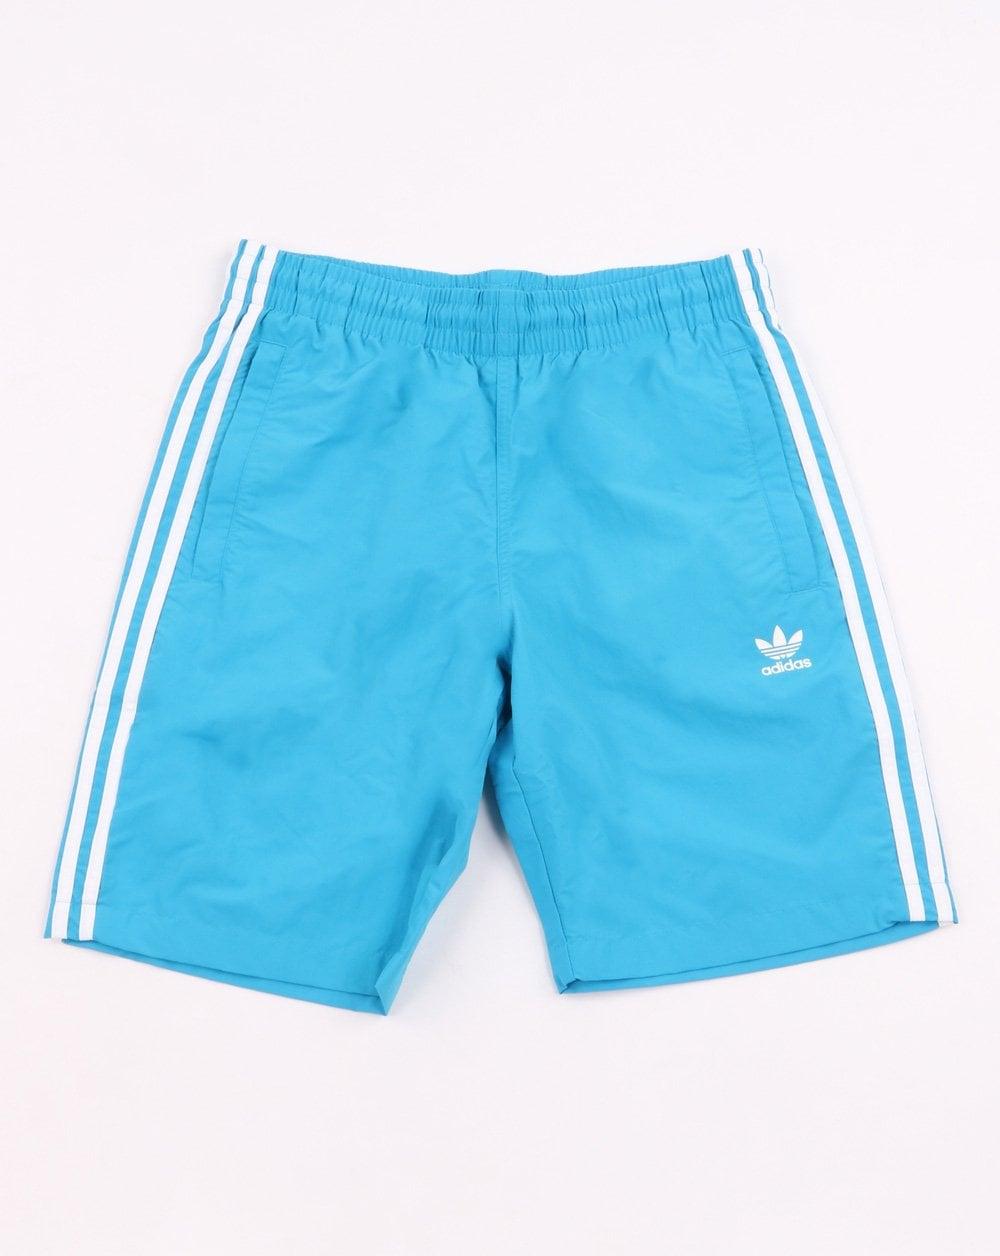 8000e07557 Adidas Originals 3 Stripes Swim Shorts Shock Cyan | 80s Casual Classics